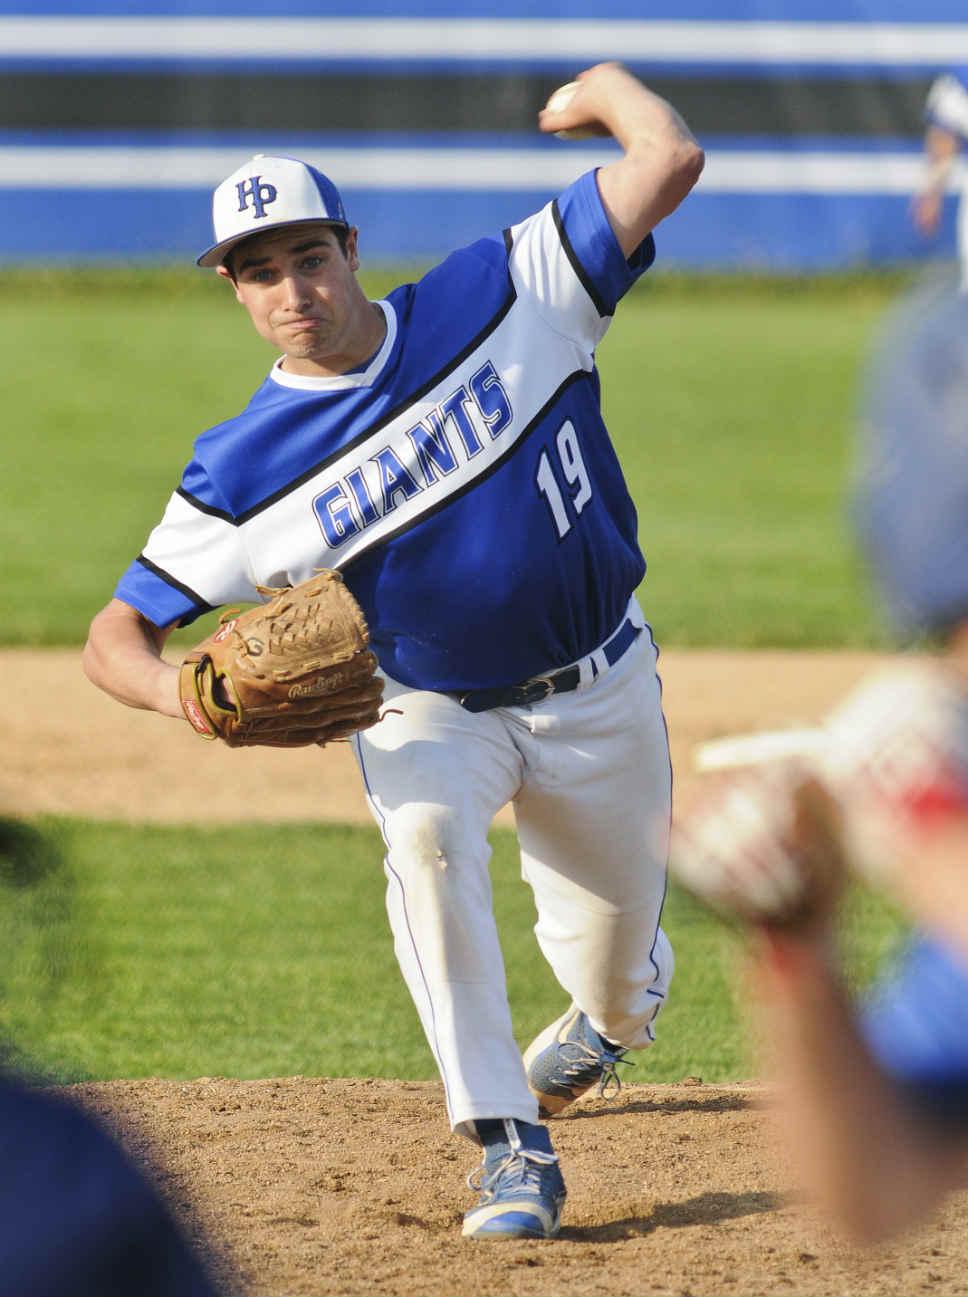 HP_Baseball_21ss